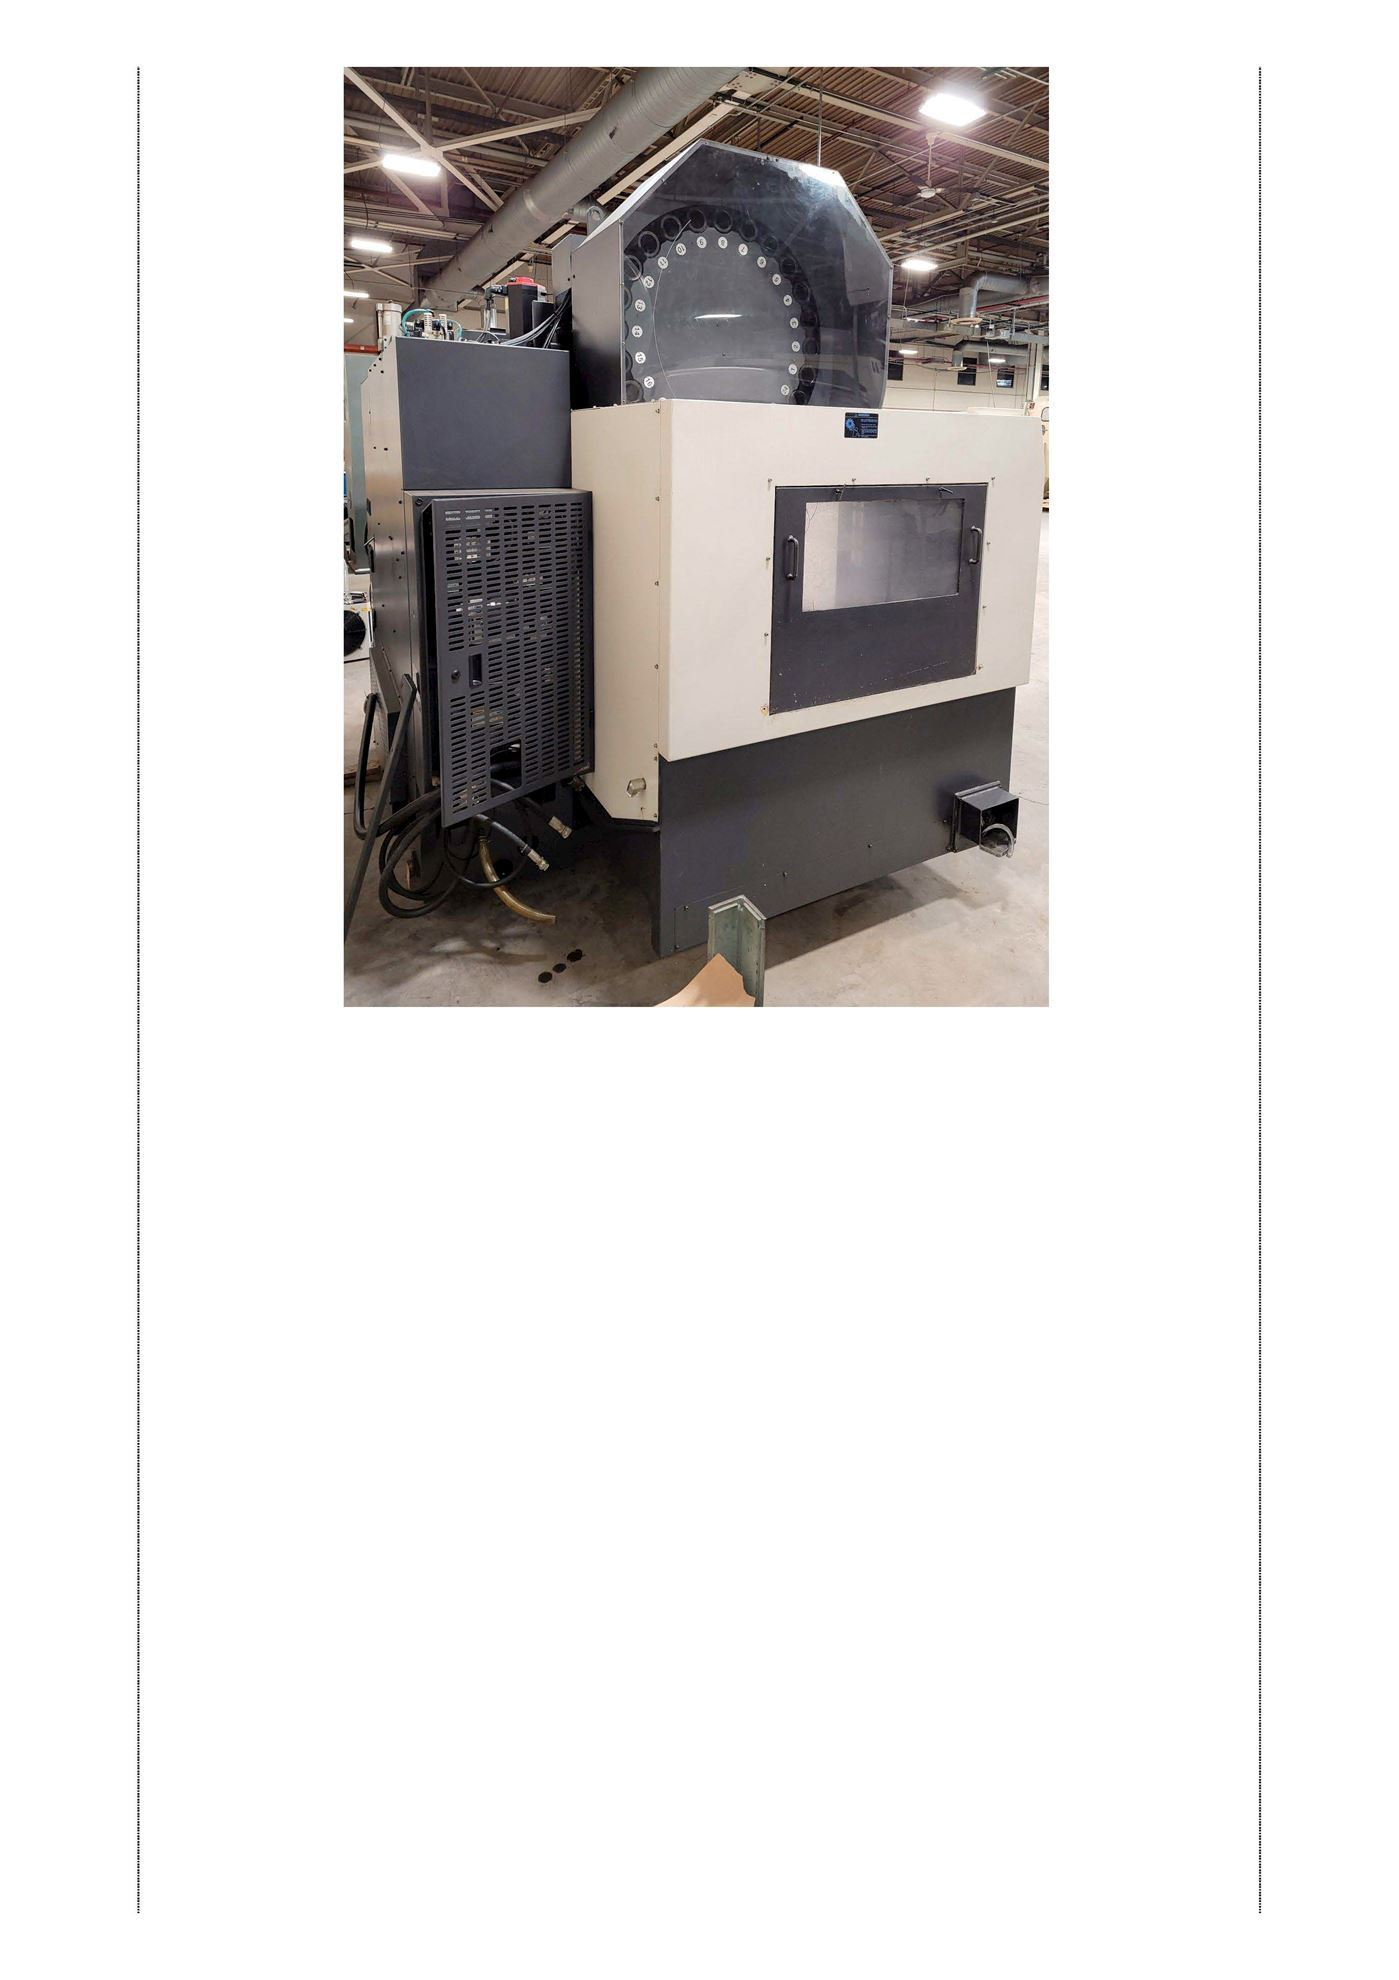 20041 - HWACHEON MODEL VESTA 1050B VERTICAL MACHINING CENTER